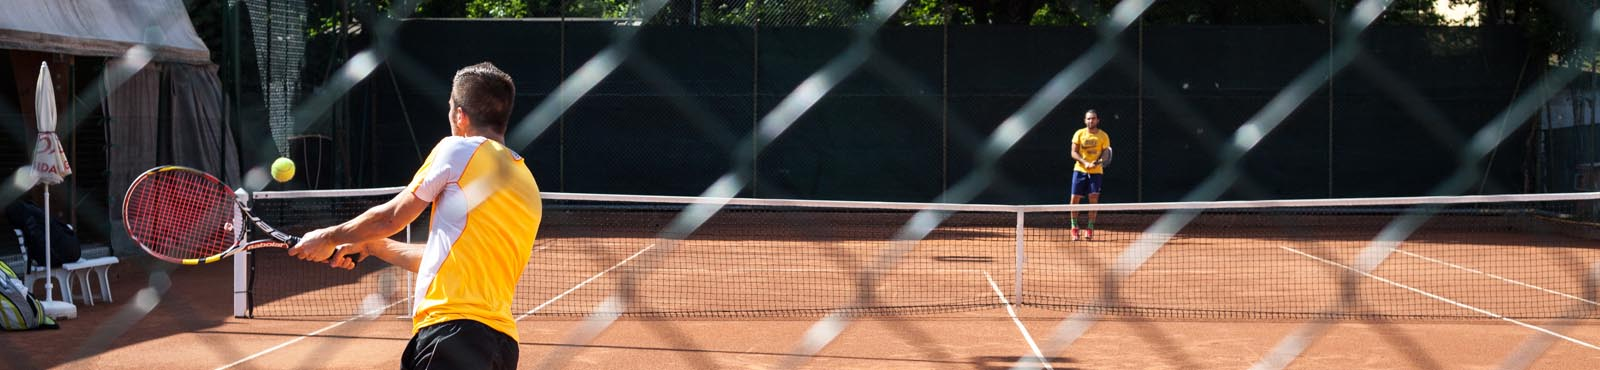 Tennis2small